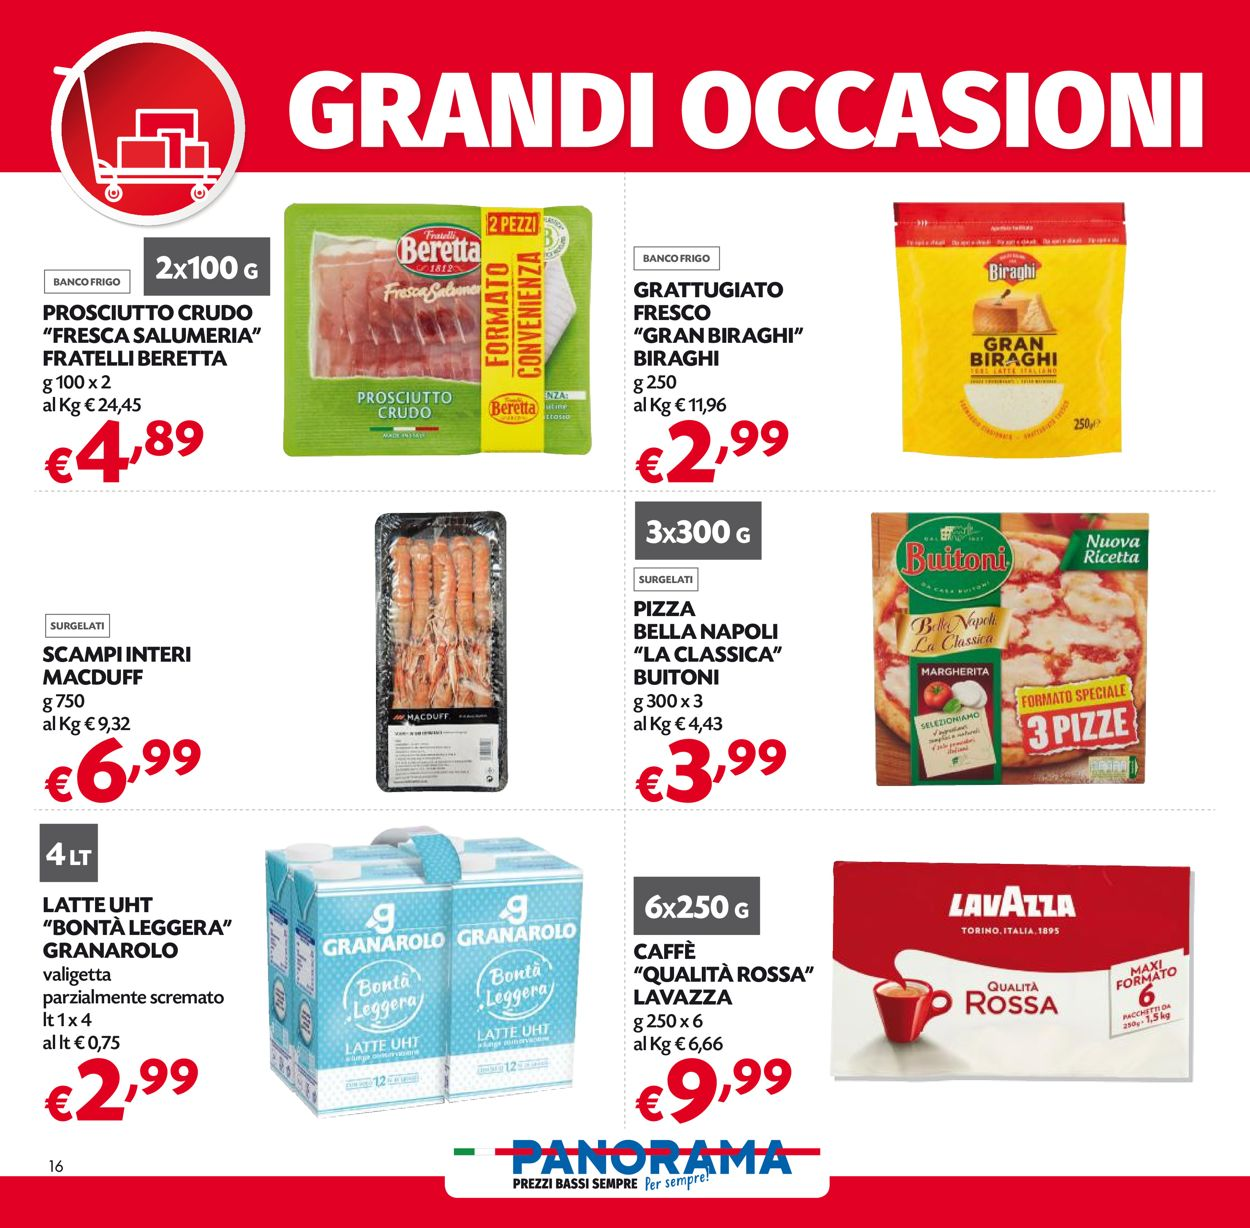 Volantino Pam Panorama - Pasqua 2021! - Offerte 22/03-05/04/2021 (Pagina 16)